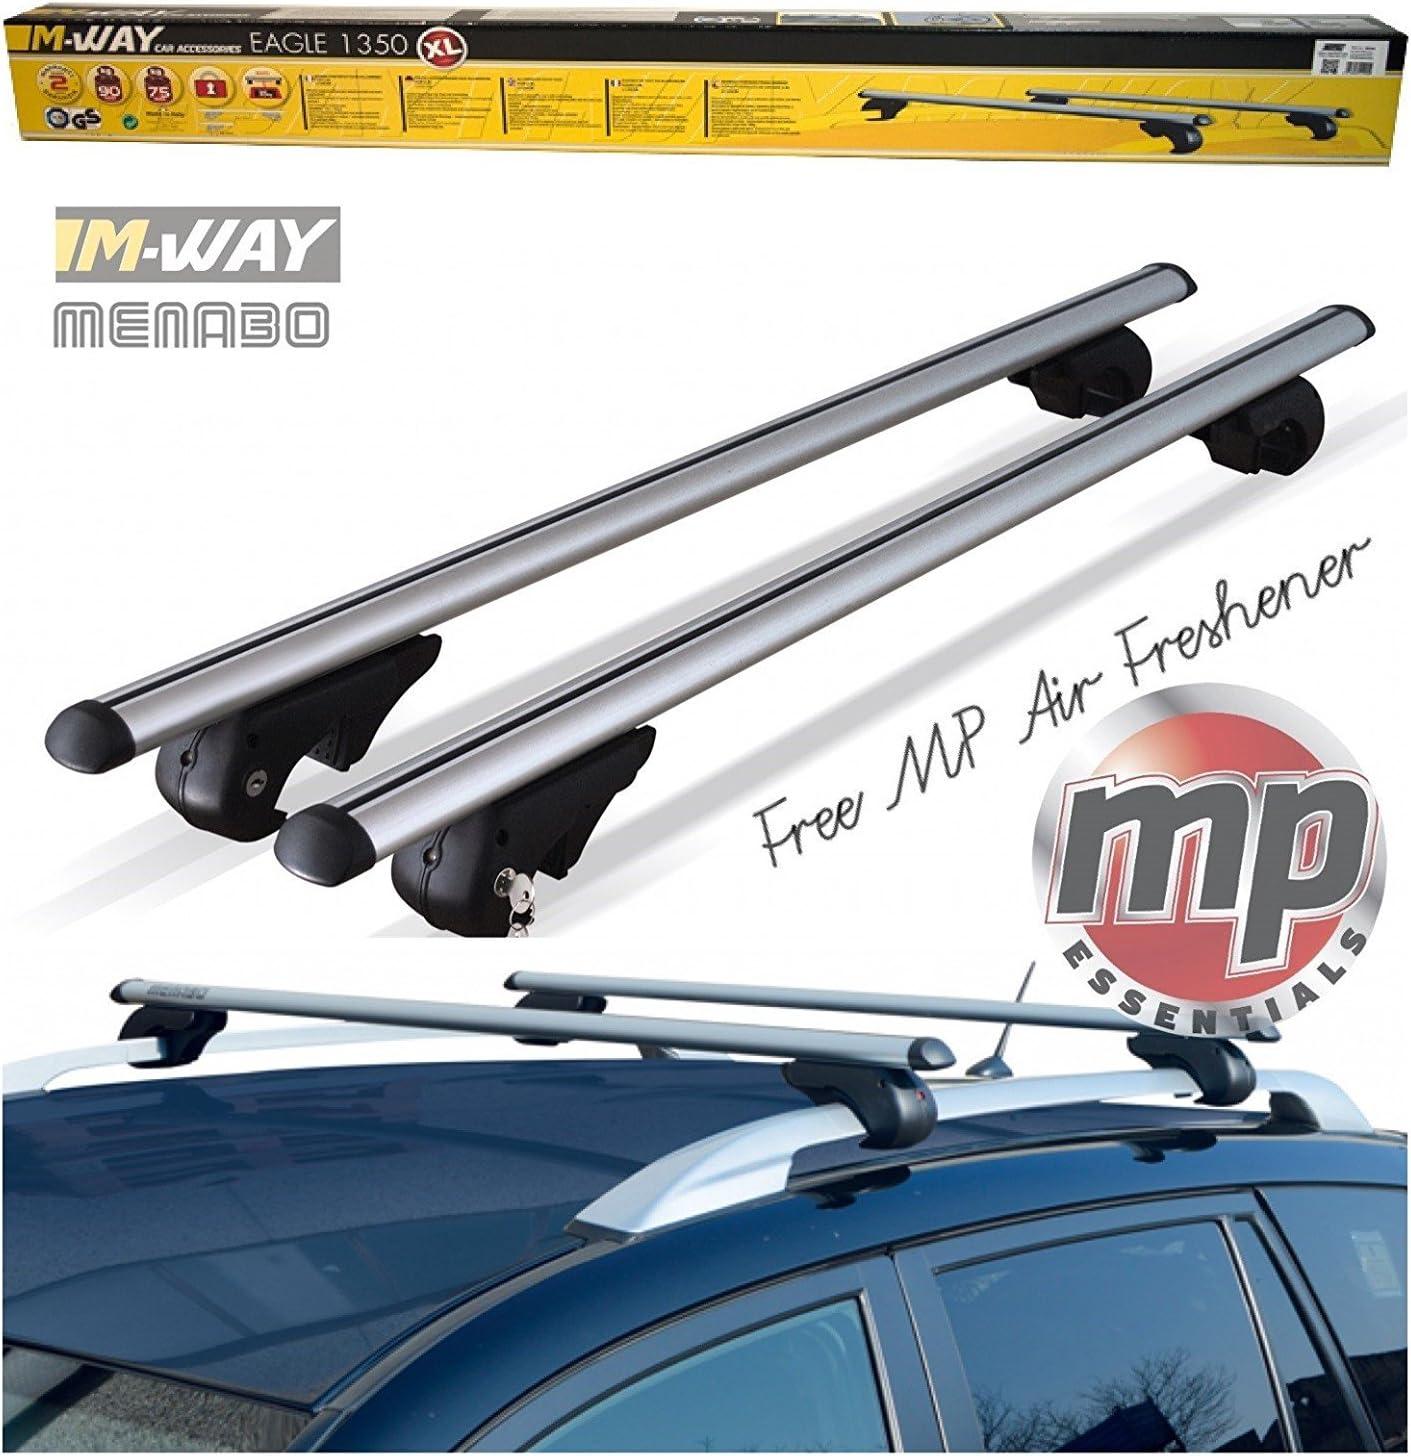 M.Way RB1040 135cm New 135mm CAR ROOF AERO Bars Rack Aluminium Locking Cross Rails